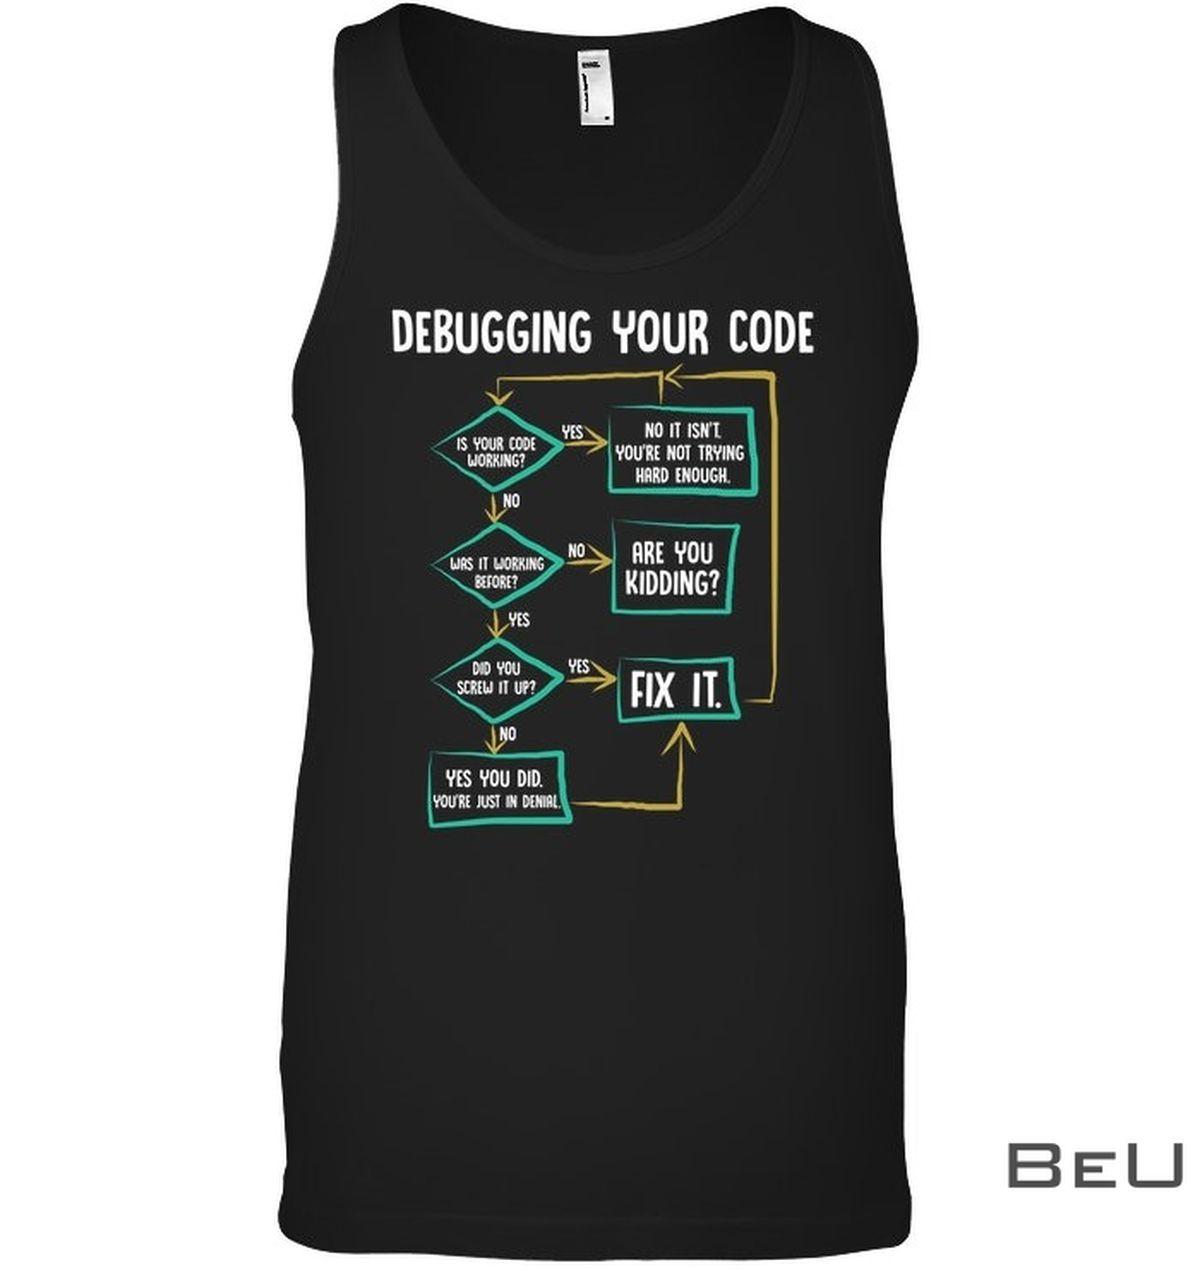 Debugging Your Code Shirtx